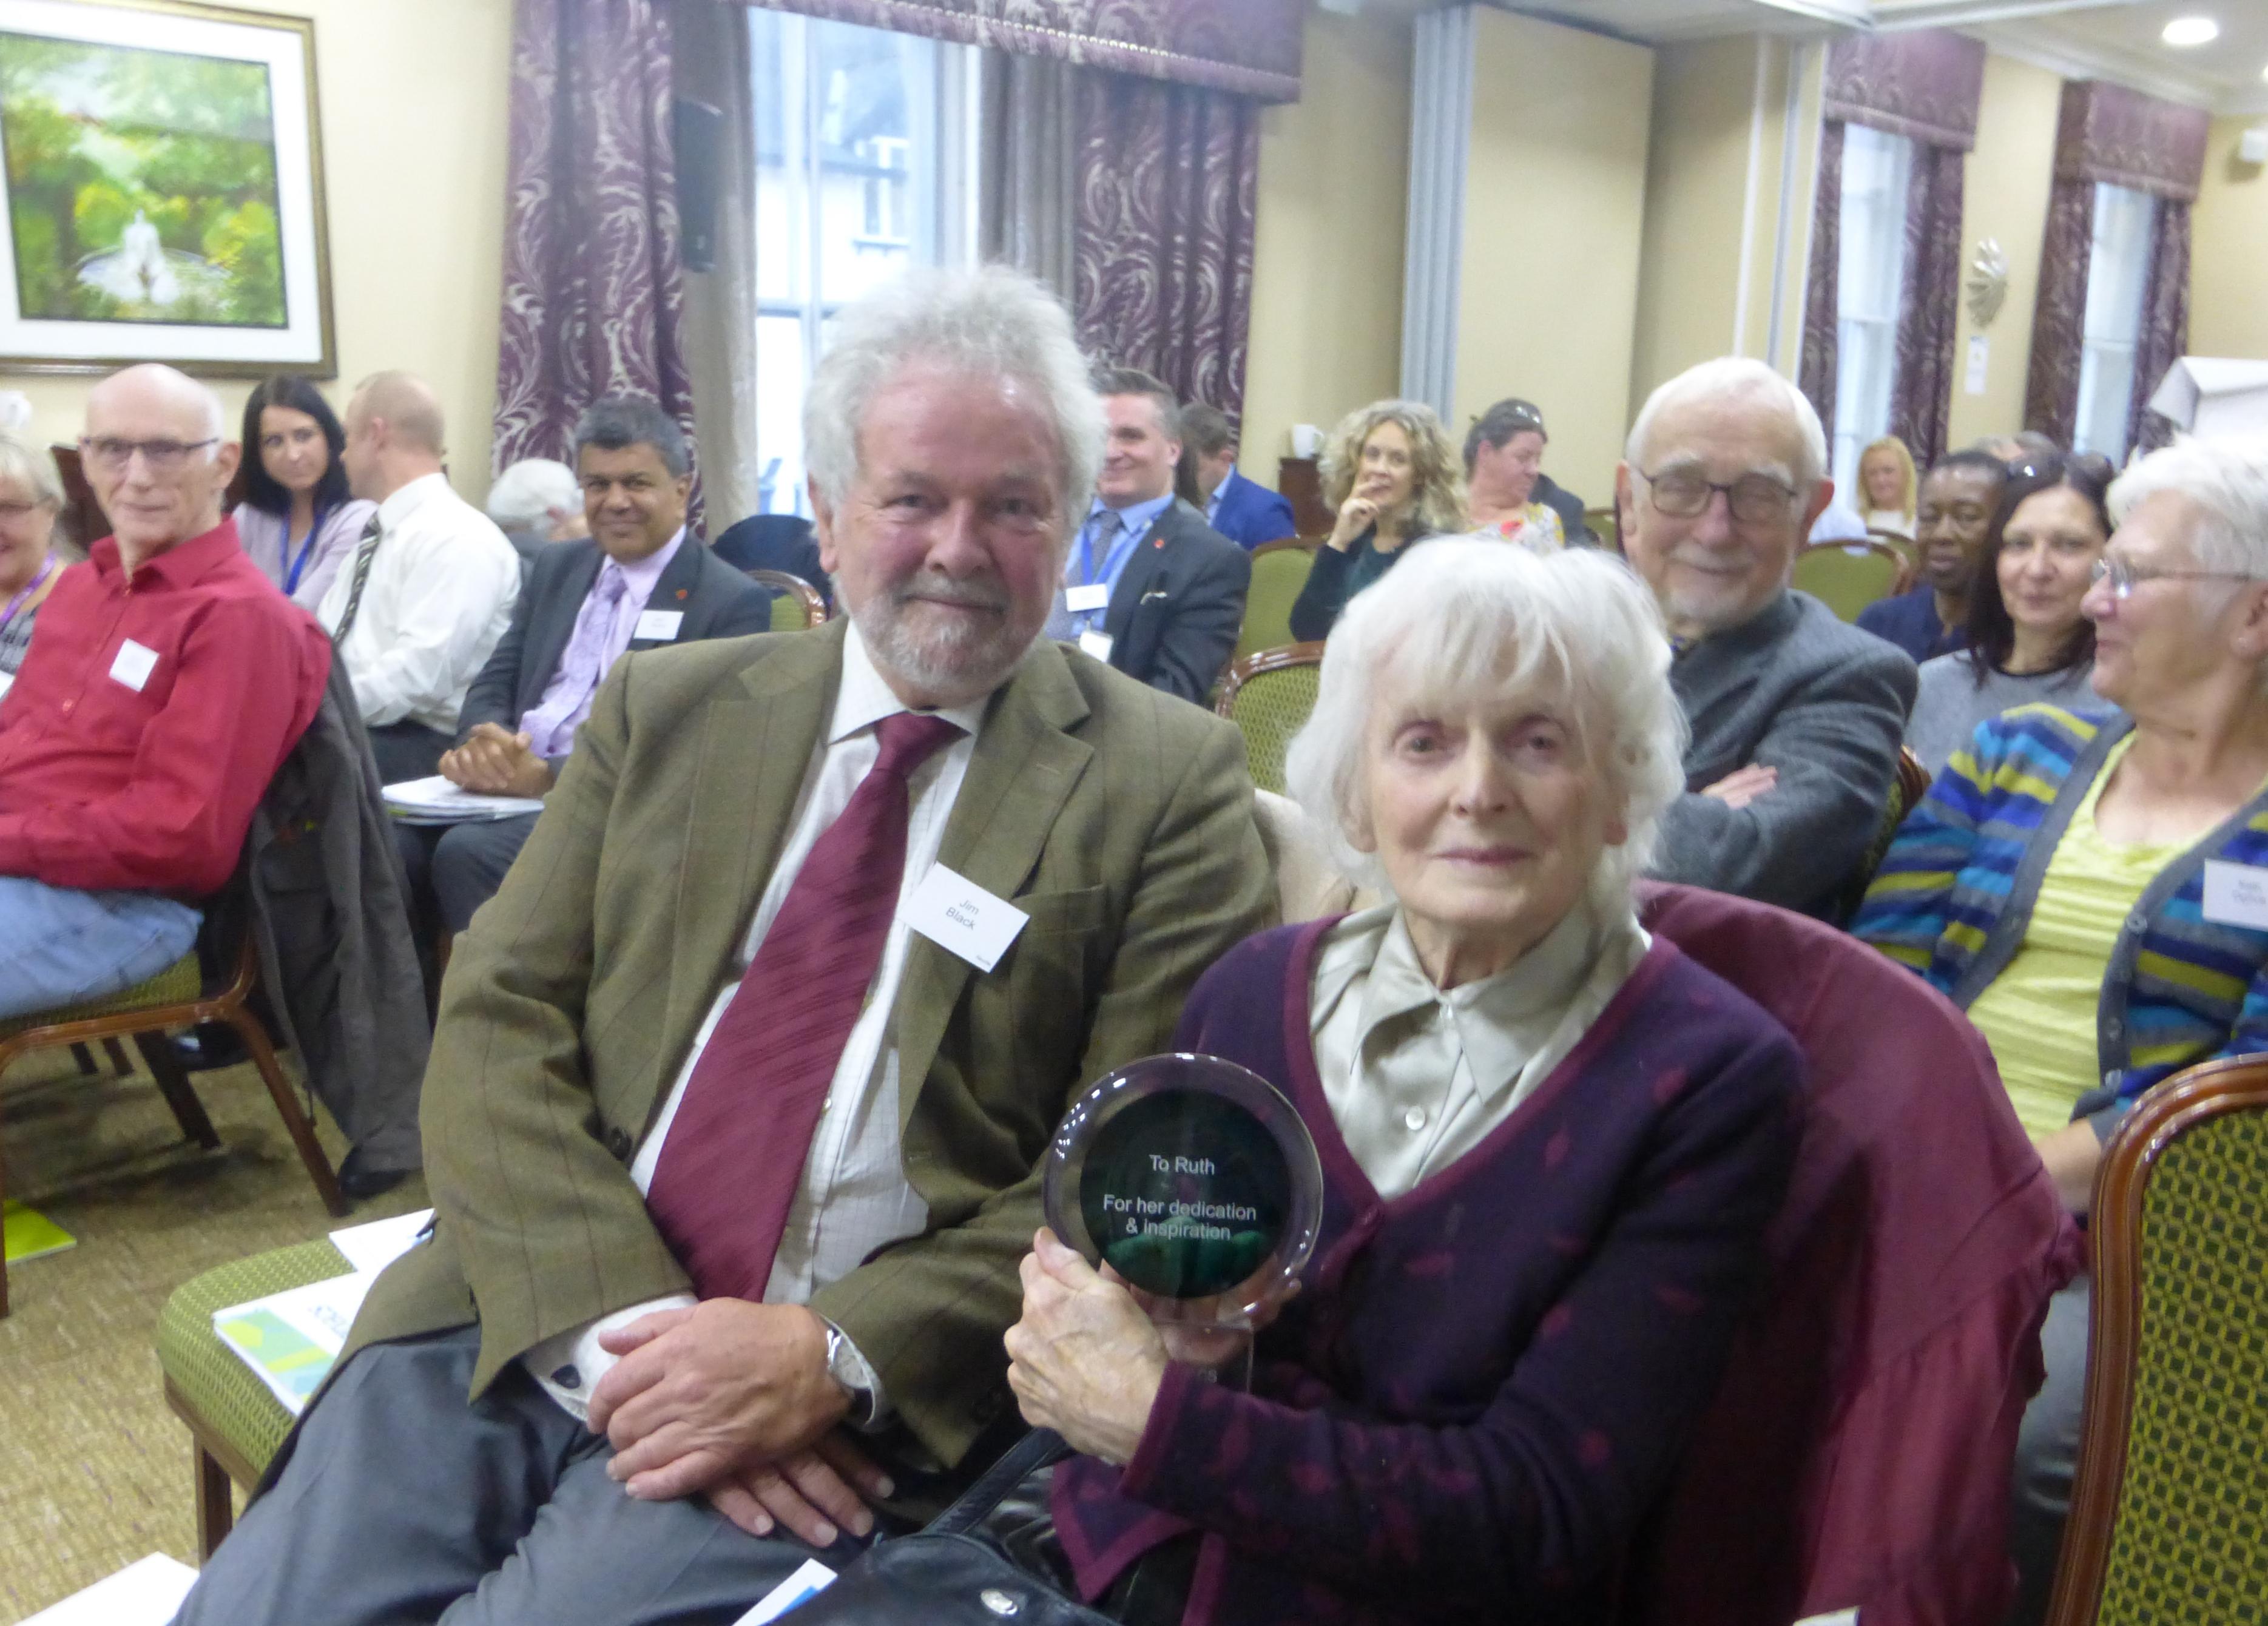 The Ruth Cranfield Awards